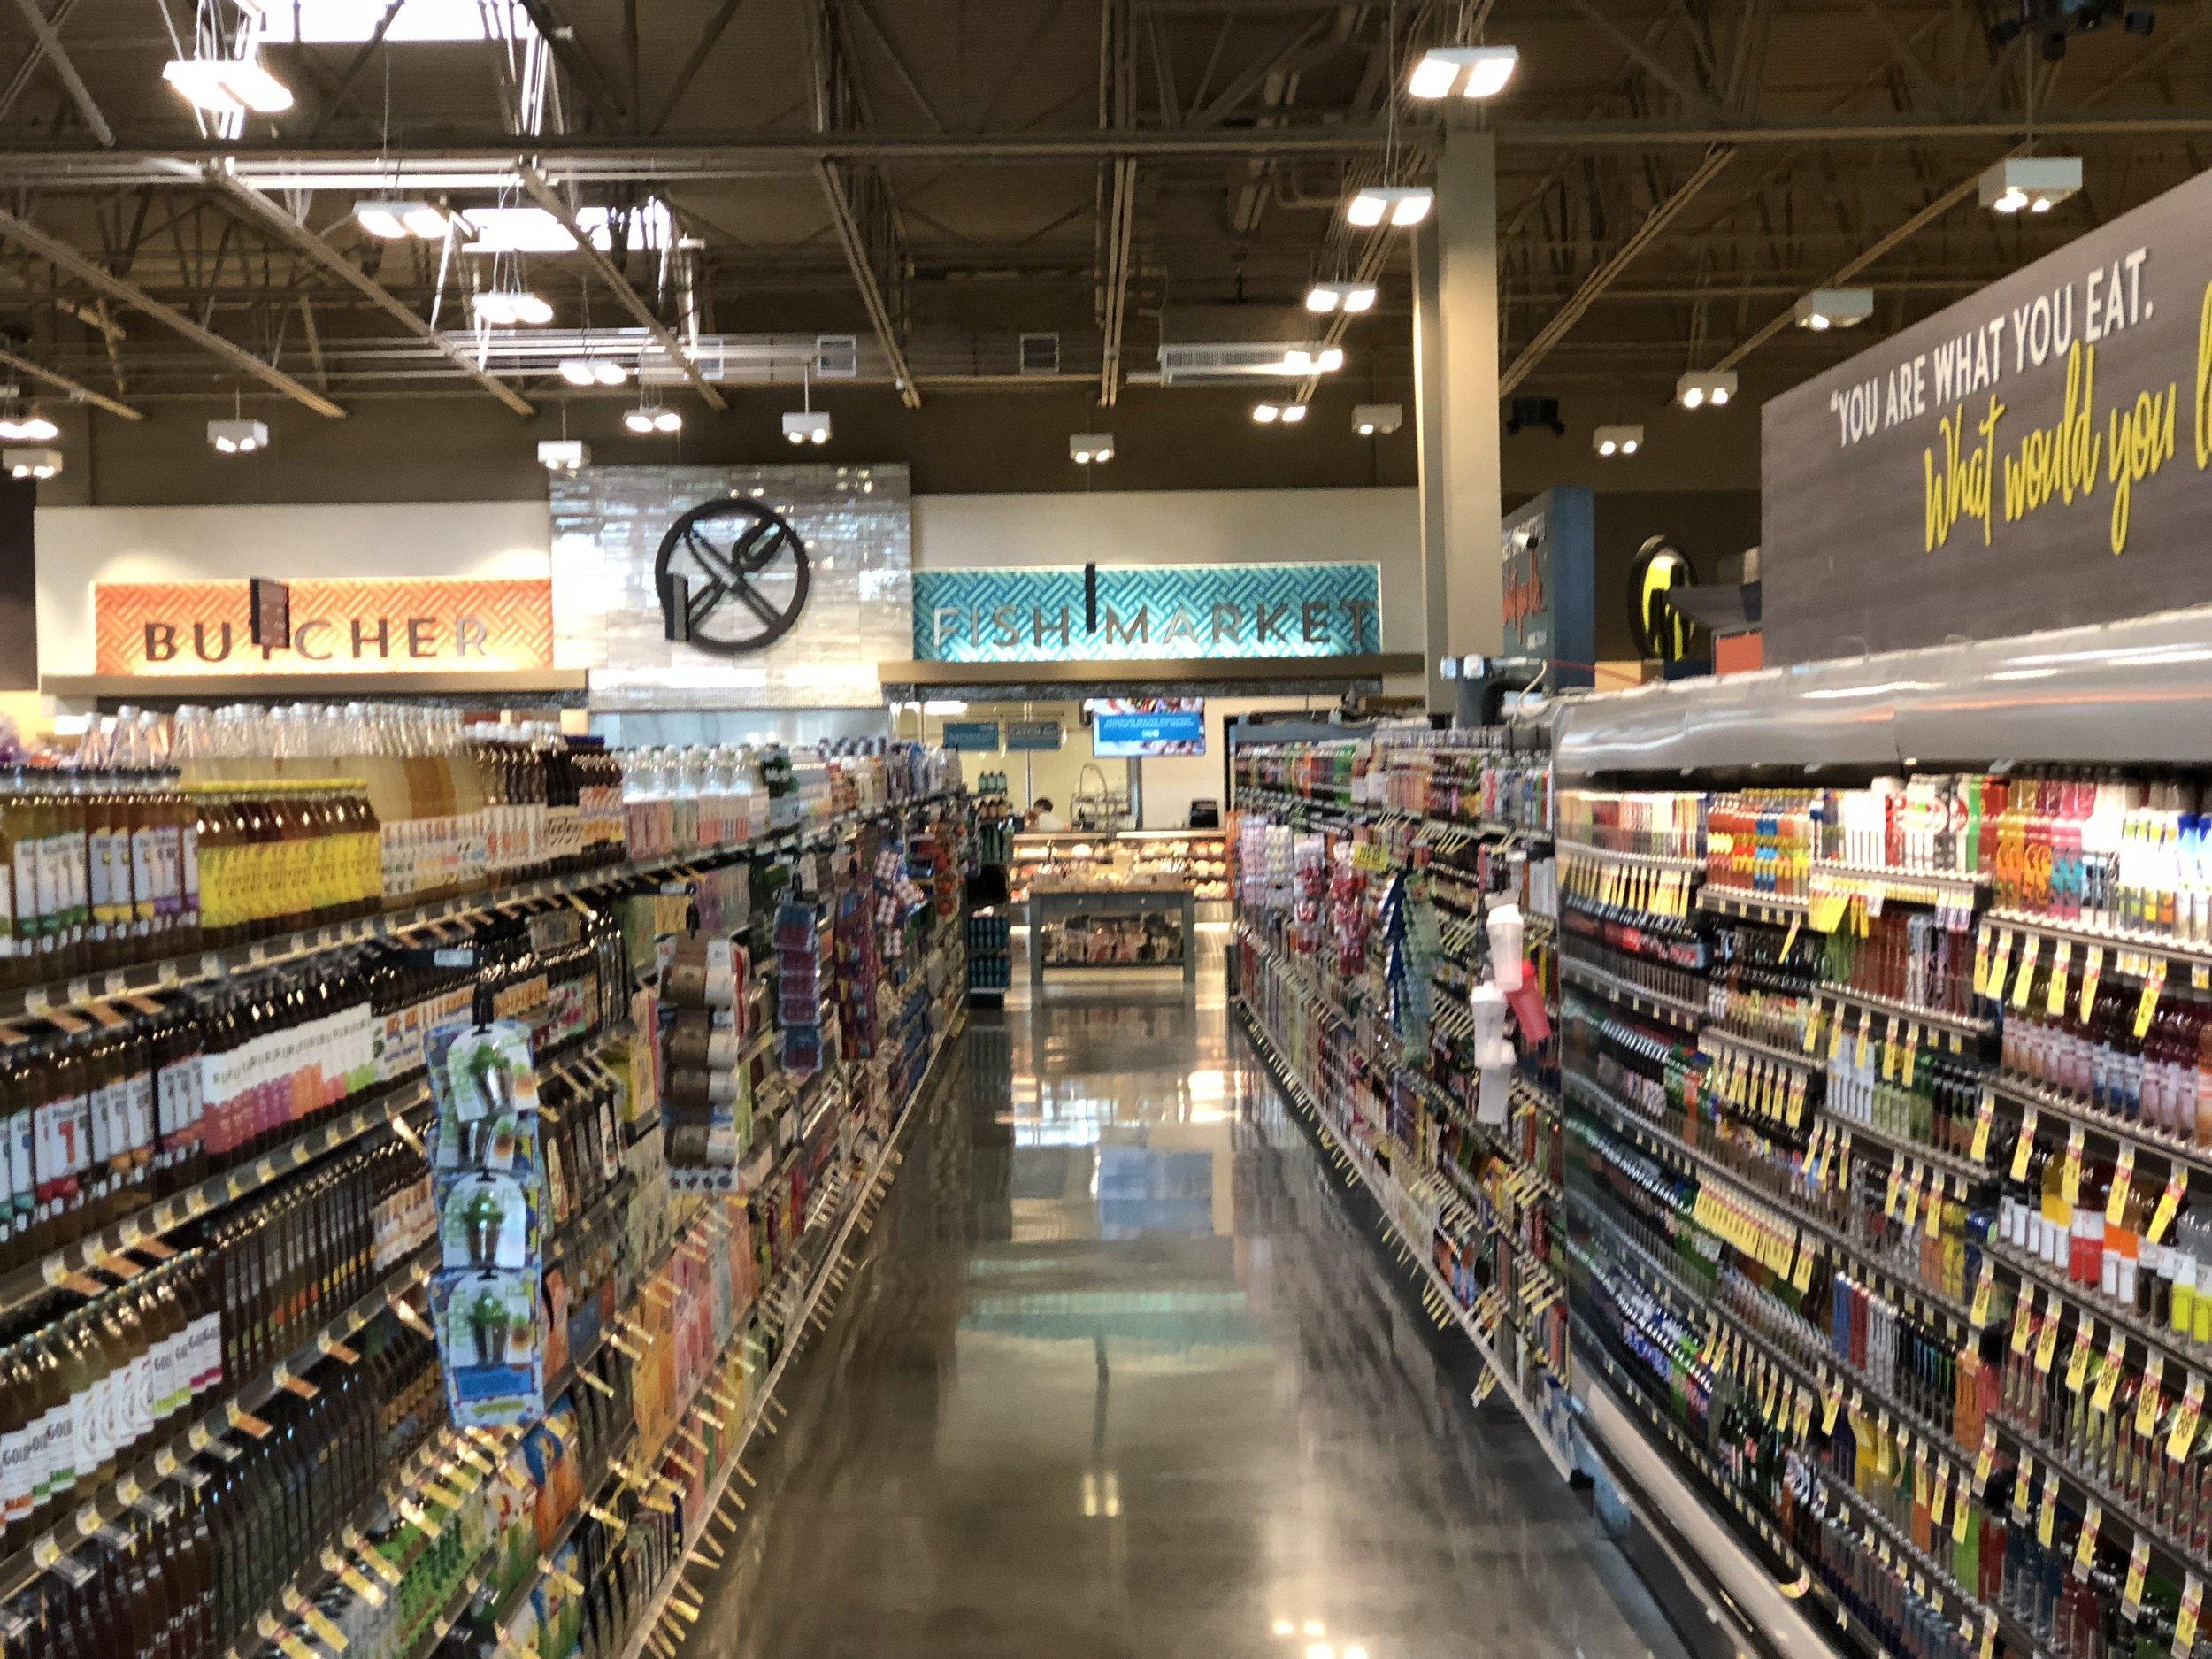 A typical aisle